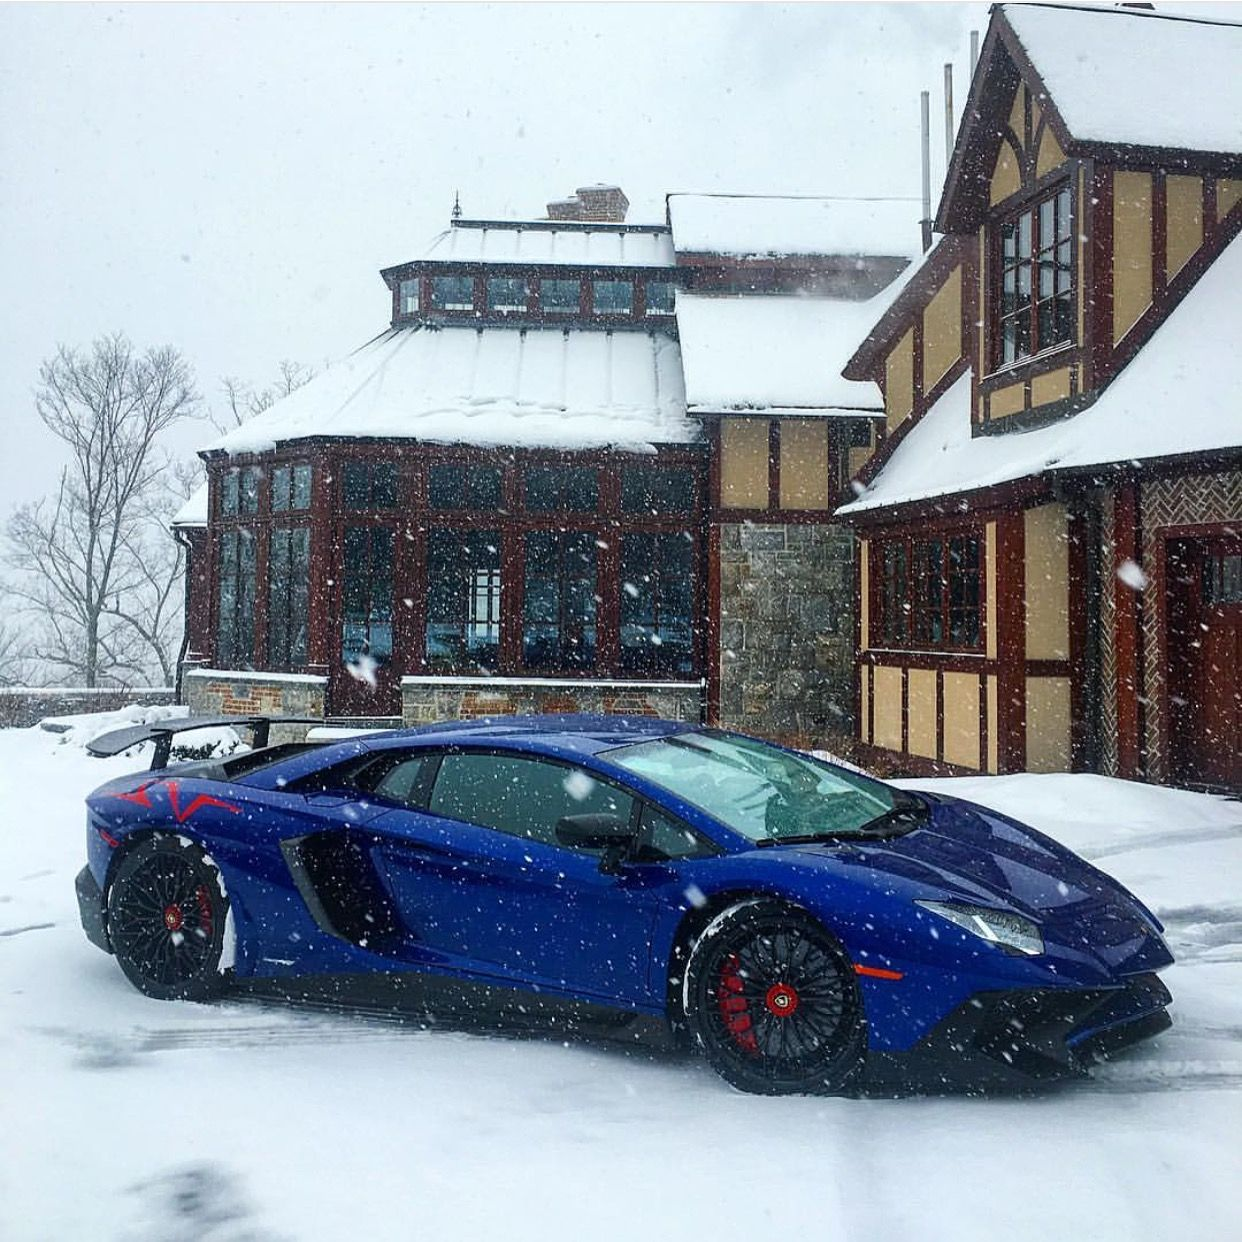 Lamborghini Aventador Super Veloce Coupe Painted In Blu Sideris W/ Red